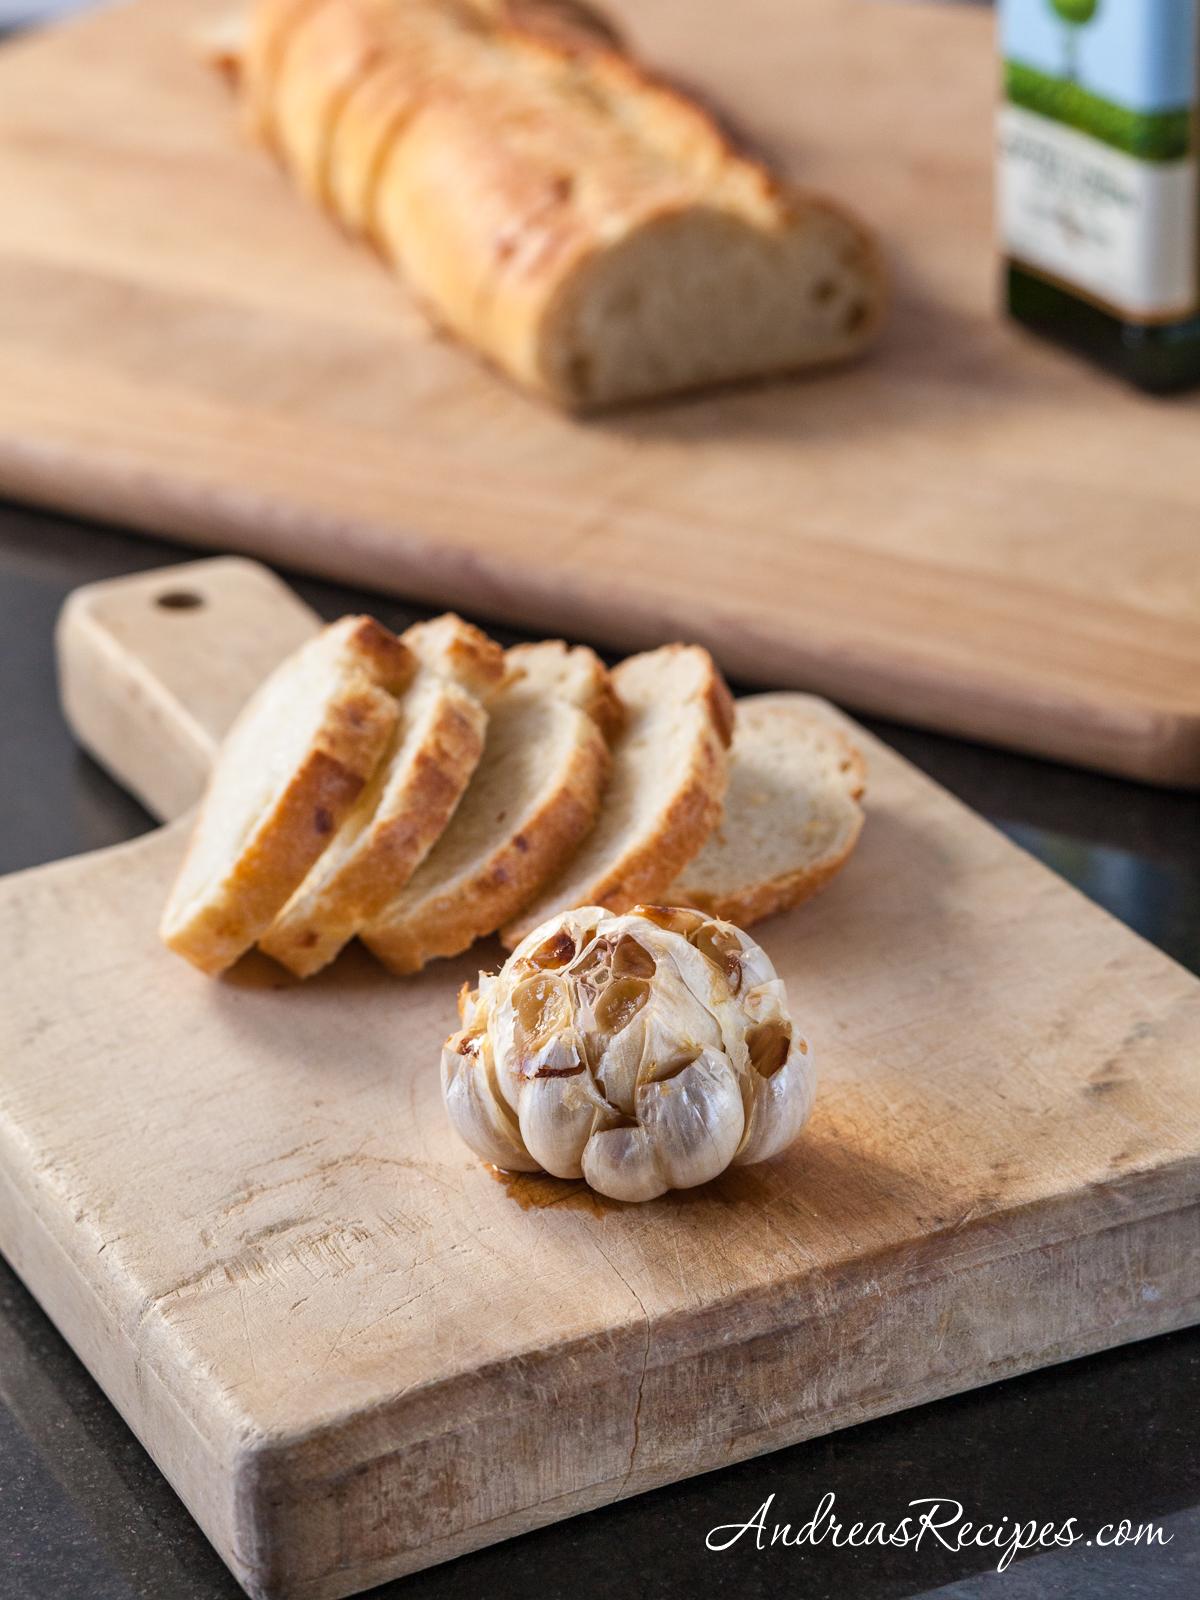 How to Roast a Head of Garlic - Andrea Meyers